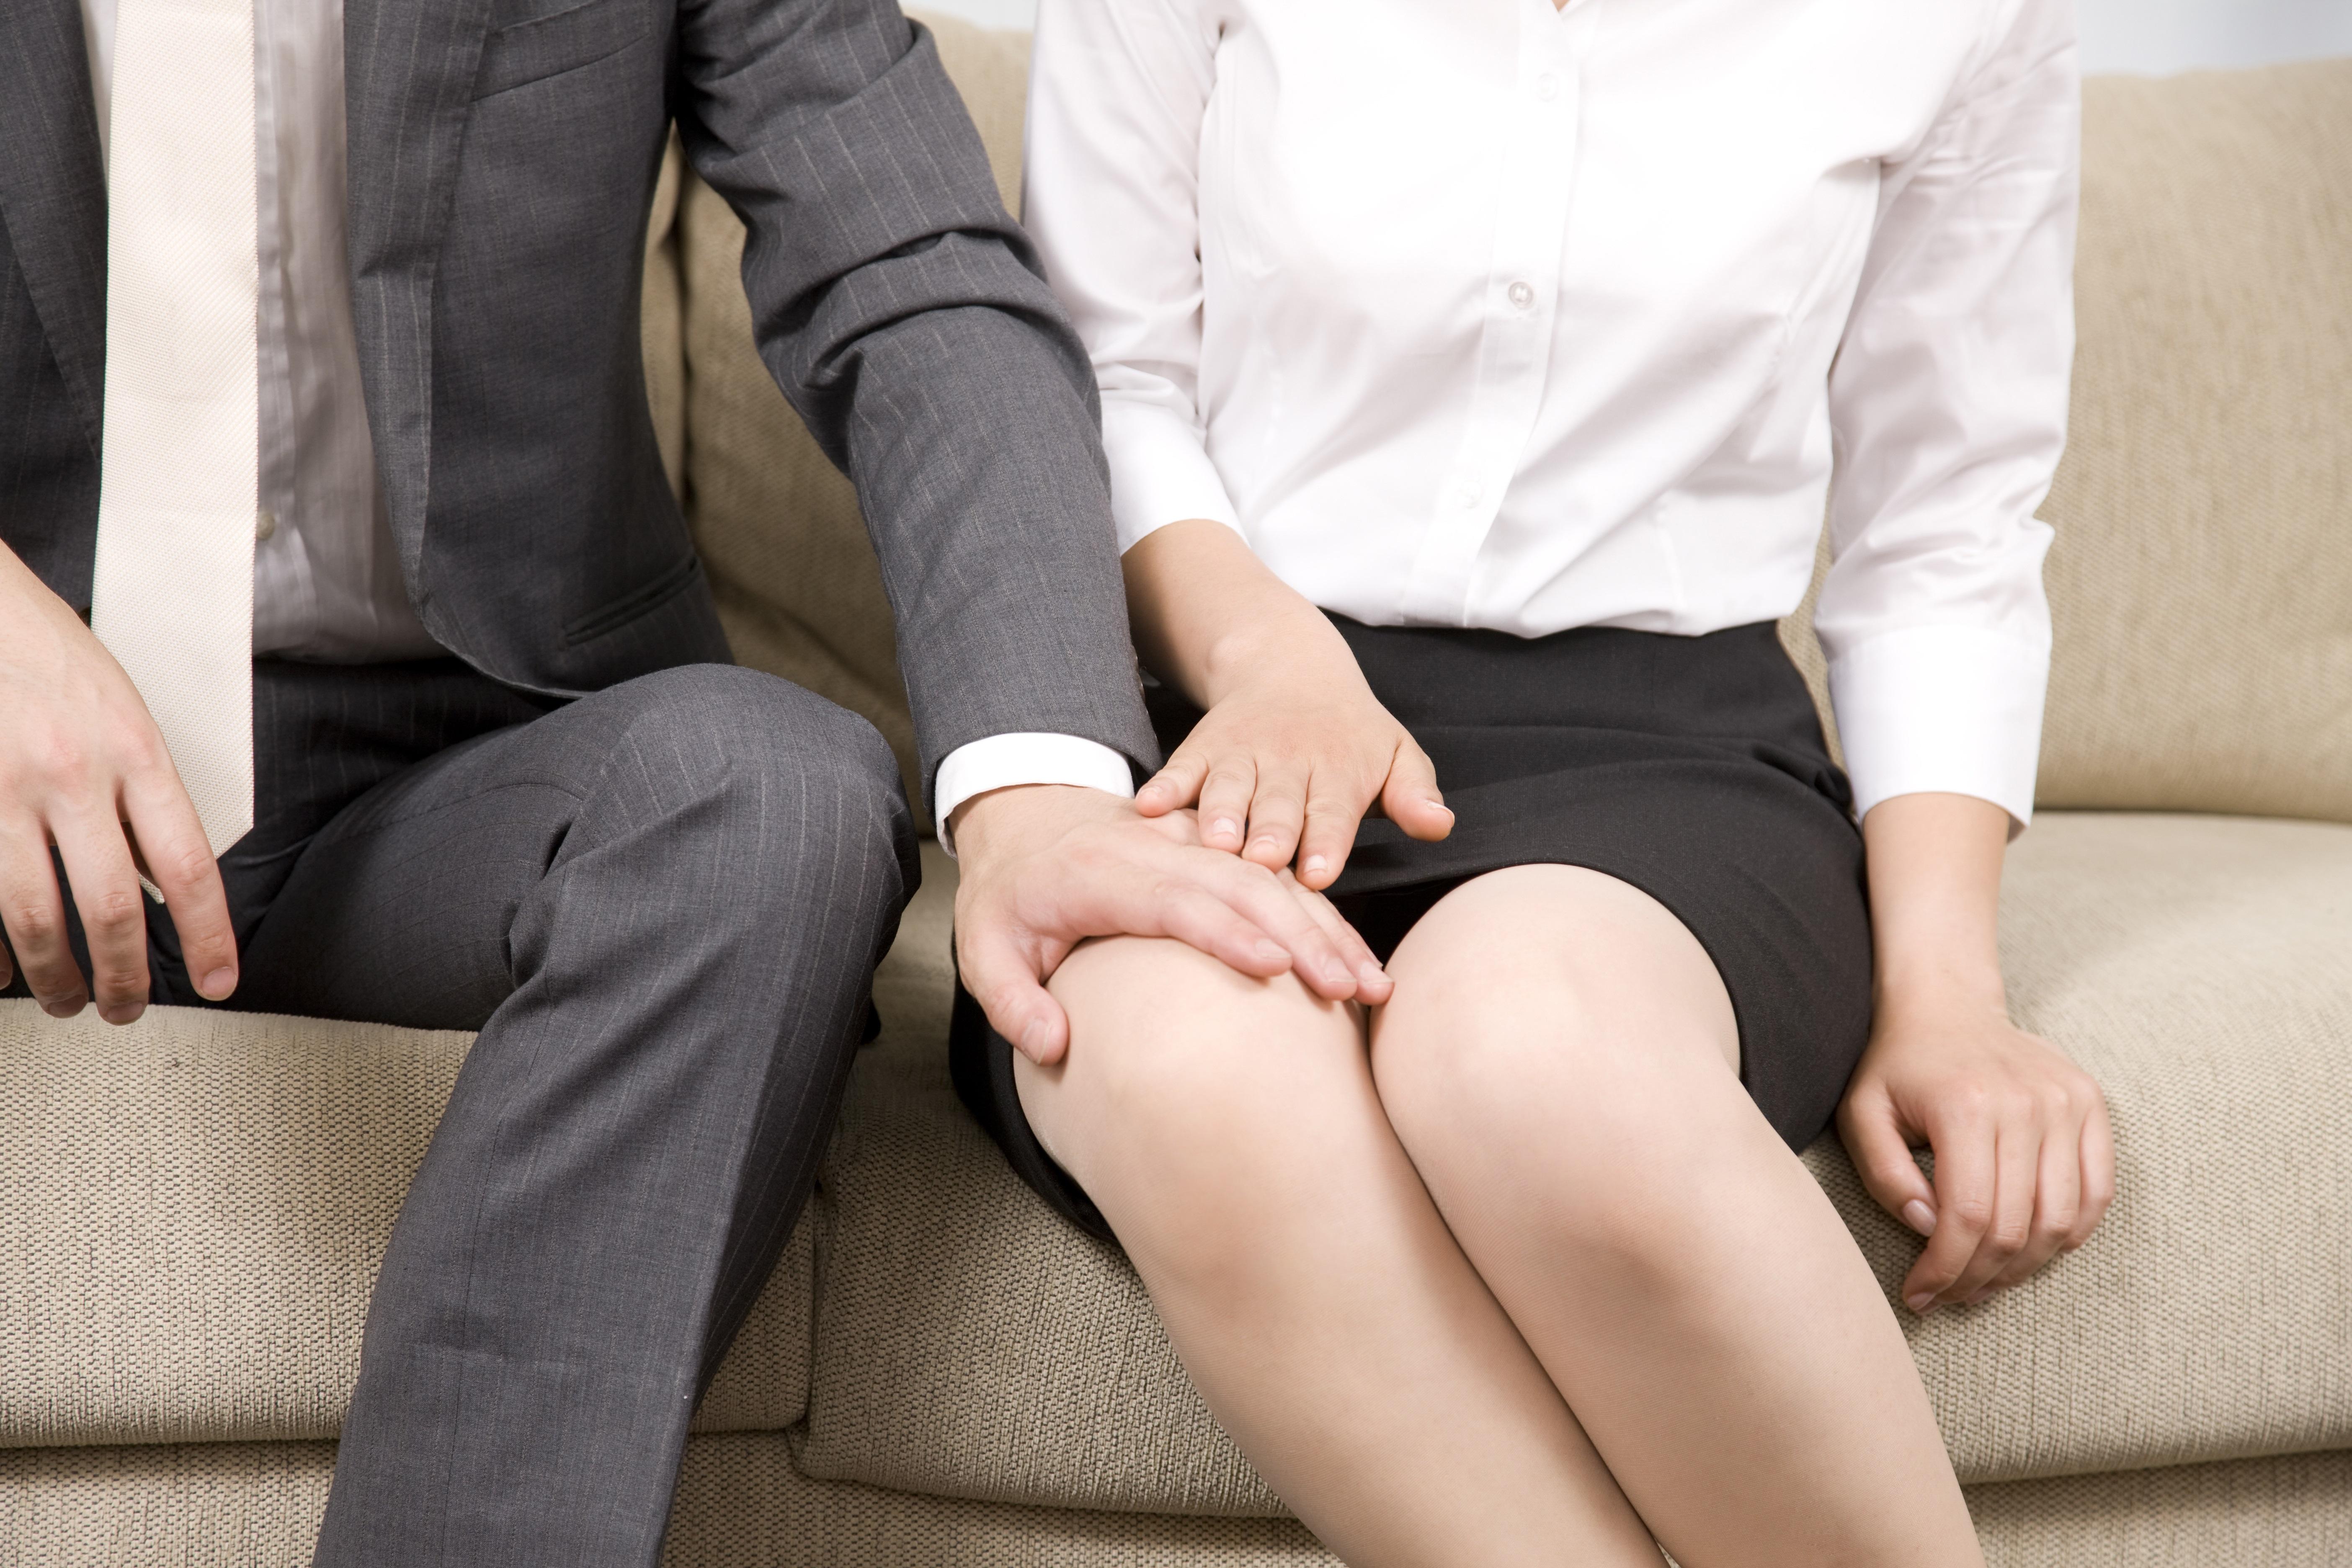 Assédio sexual no ambiente de trabalho